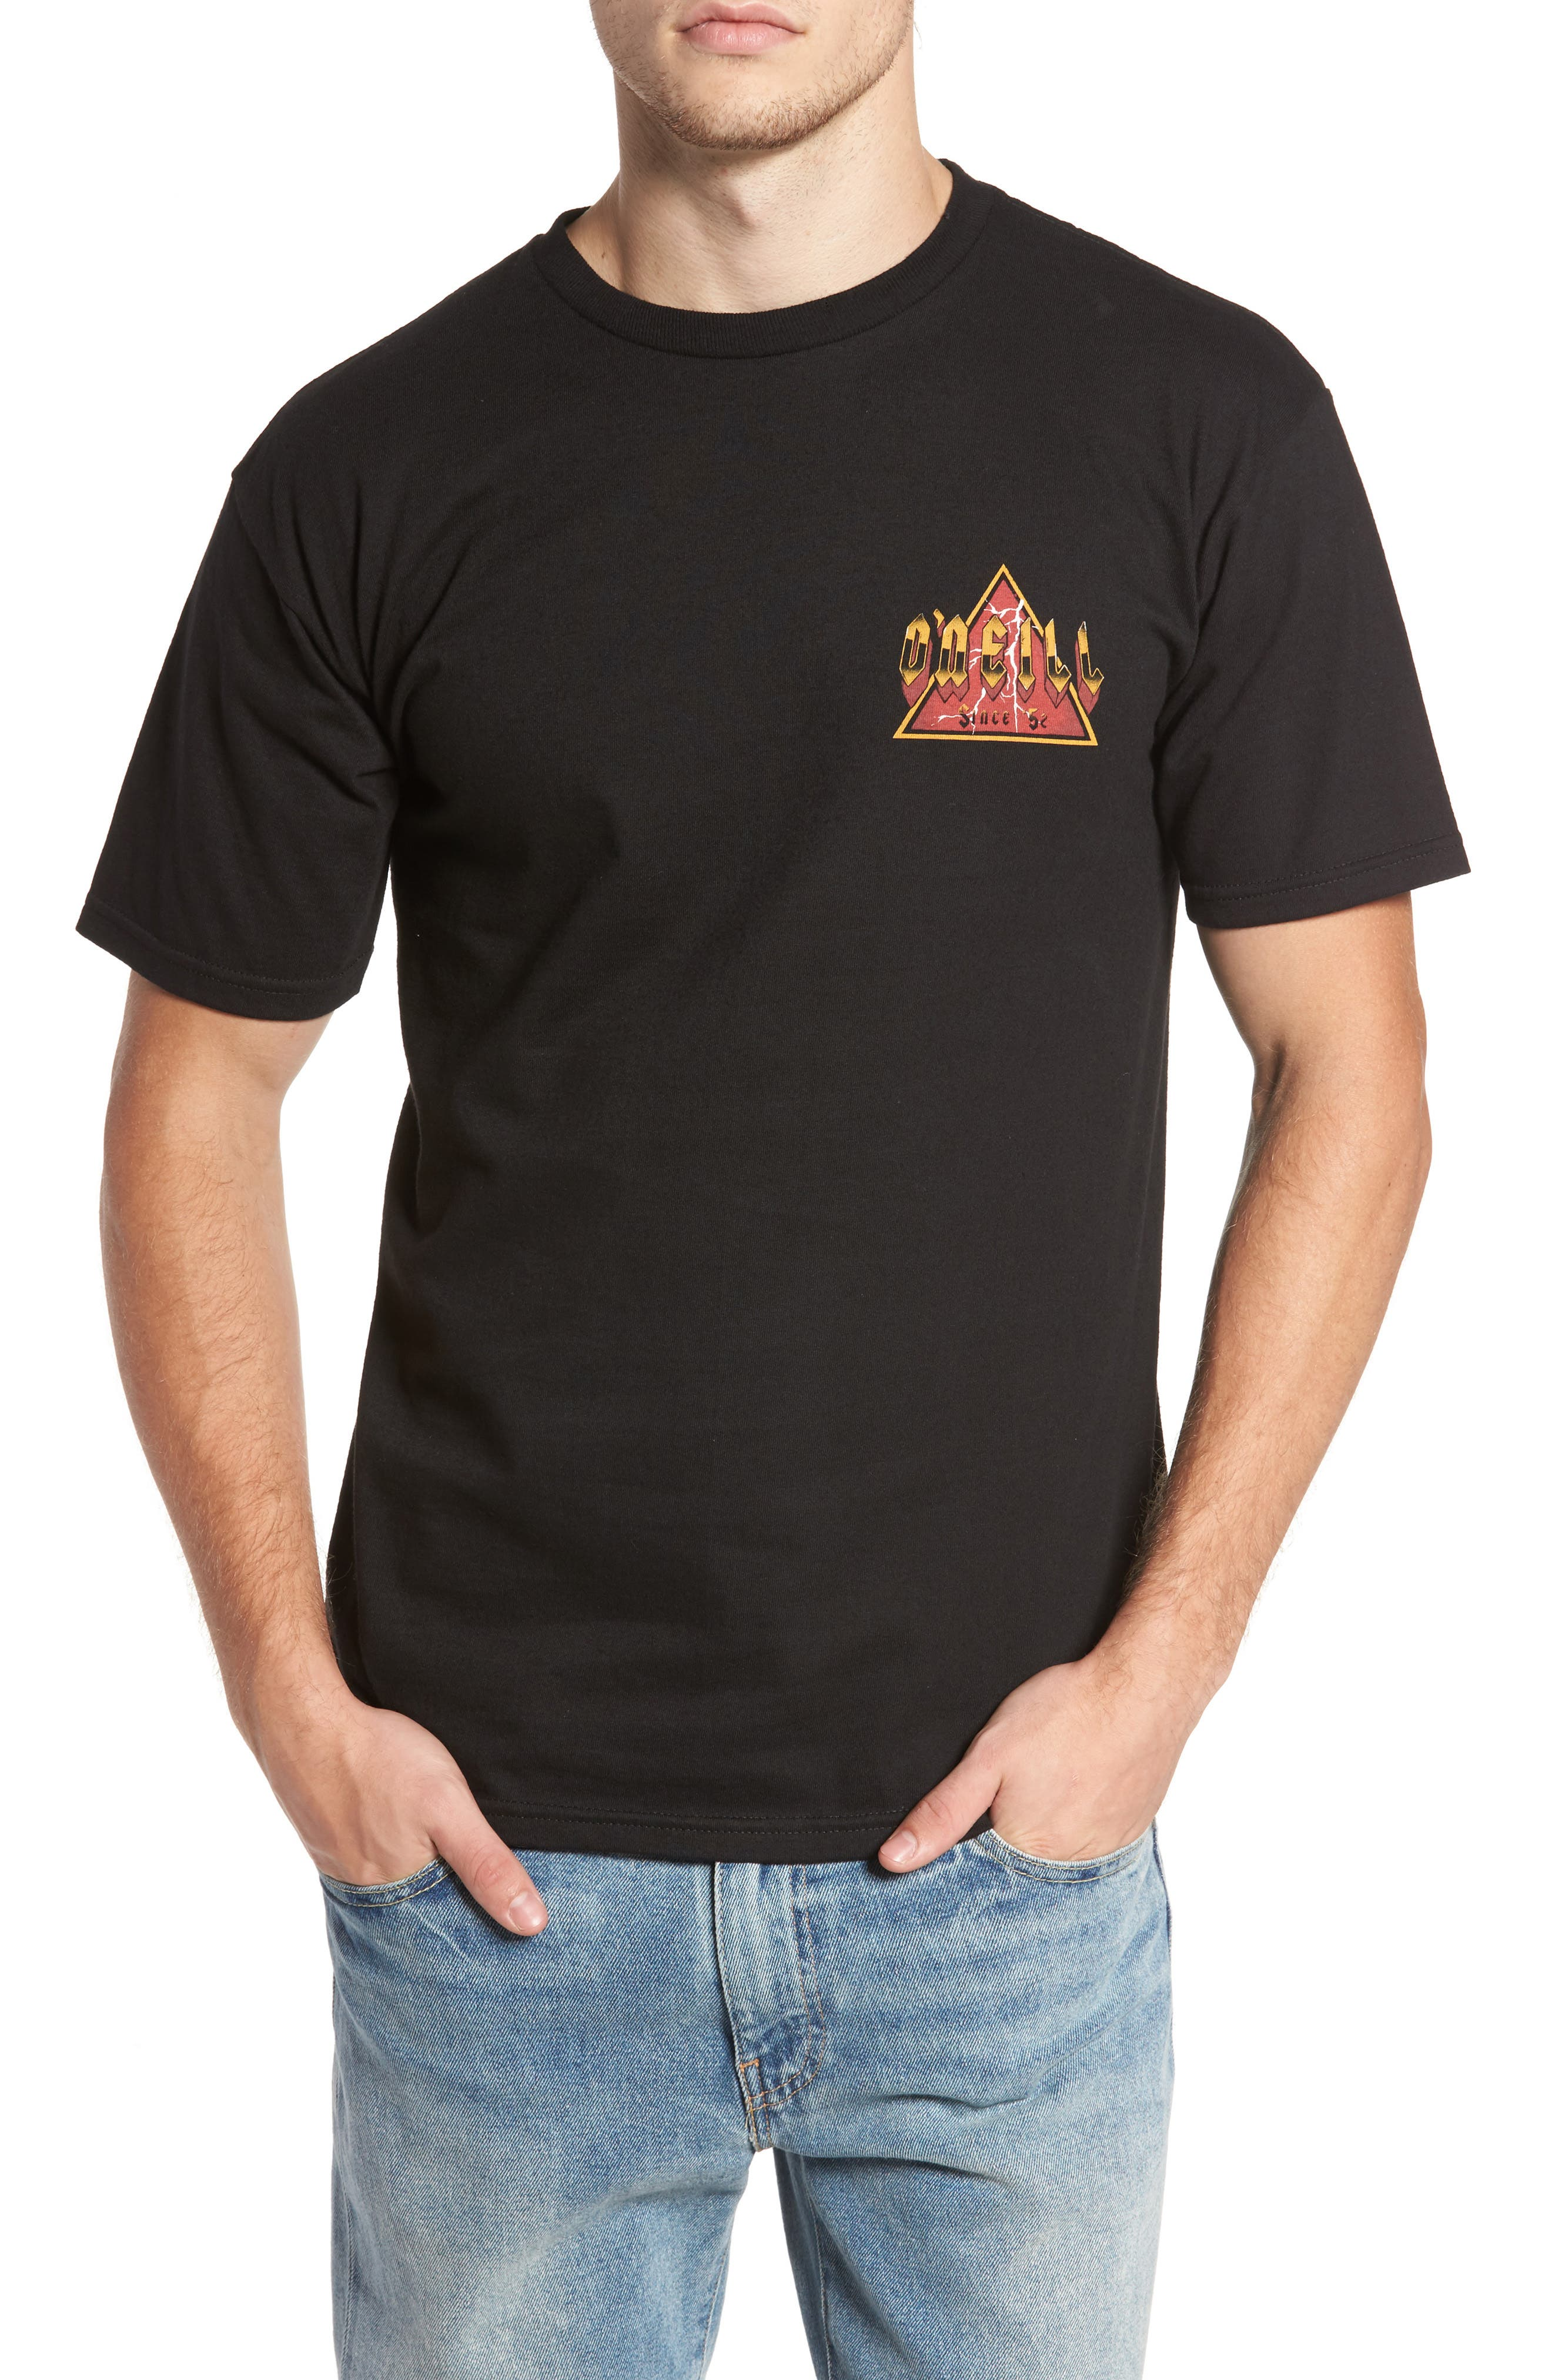 Main Image - O'Neill Metal Madness Graphic T-Shirt